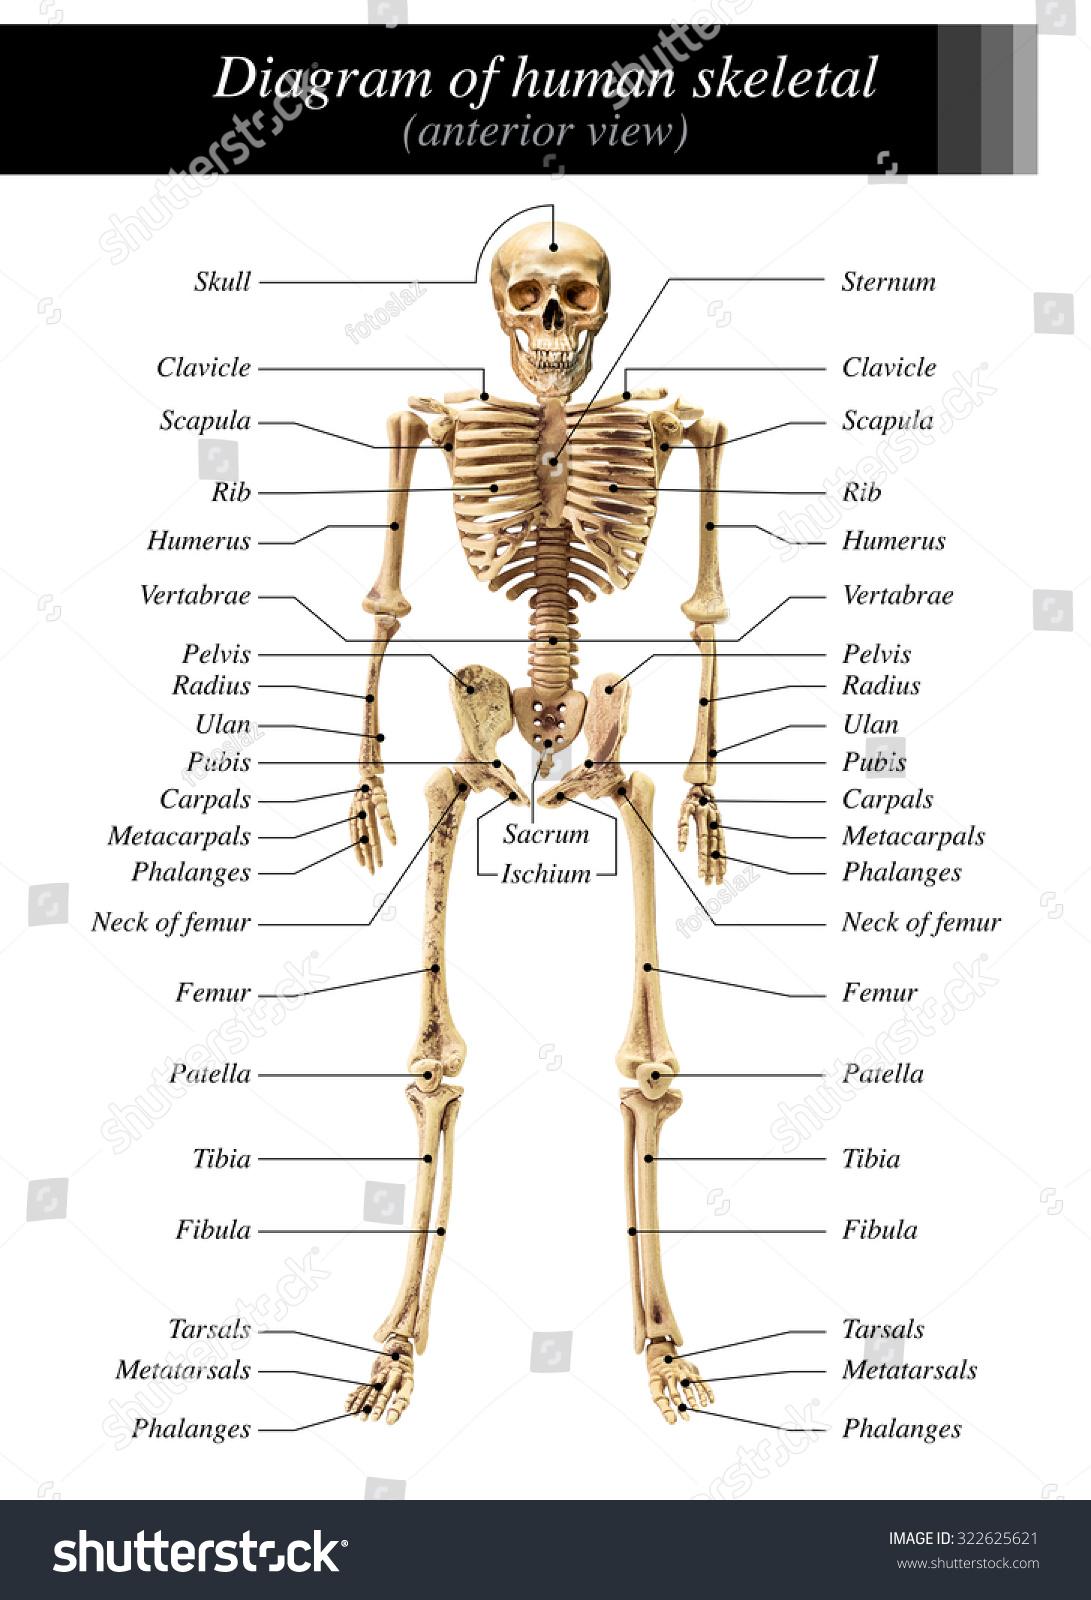 Blank Posterior Skeleton Diagram